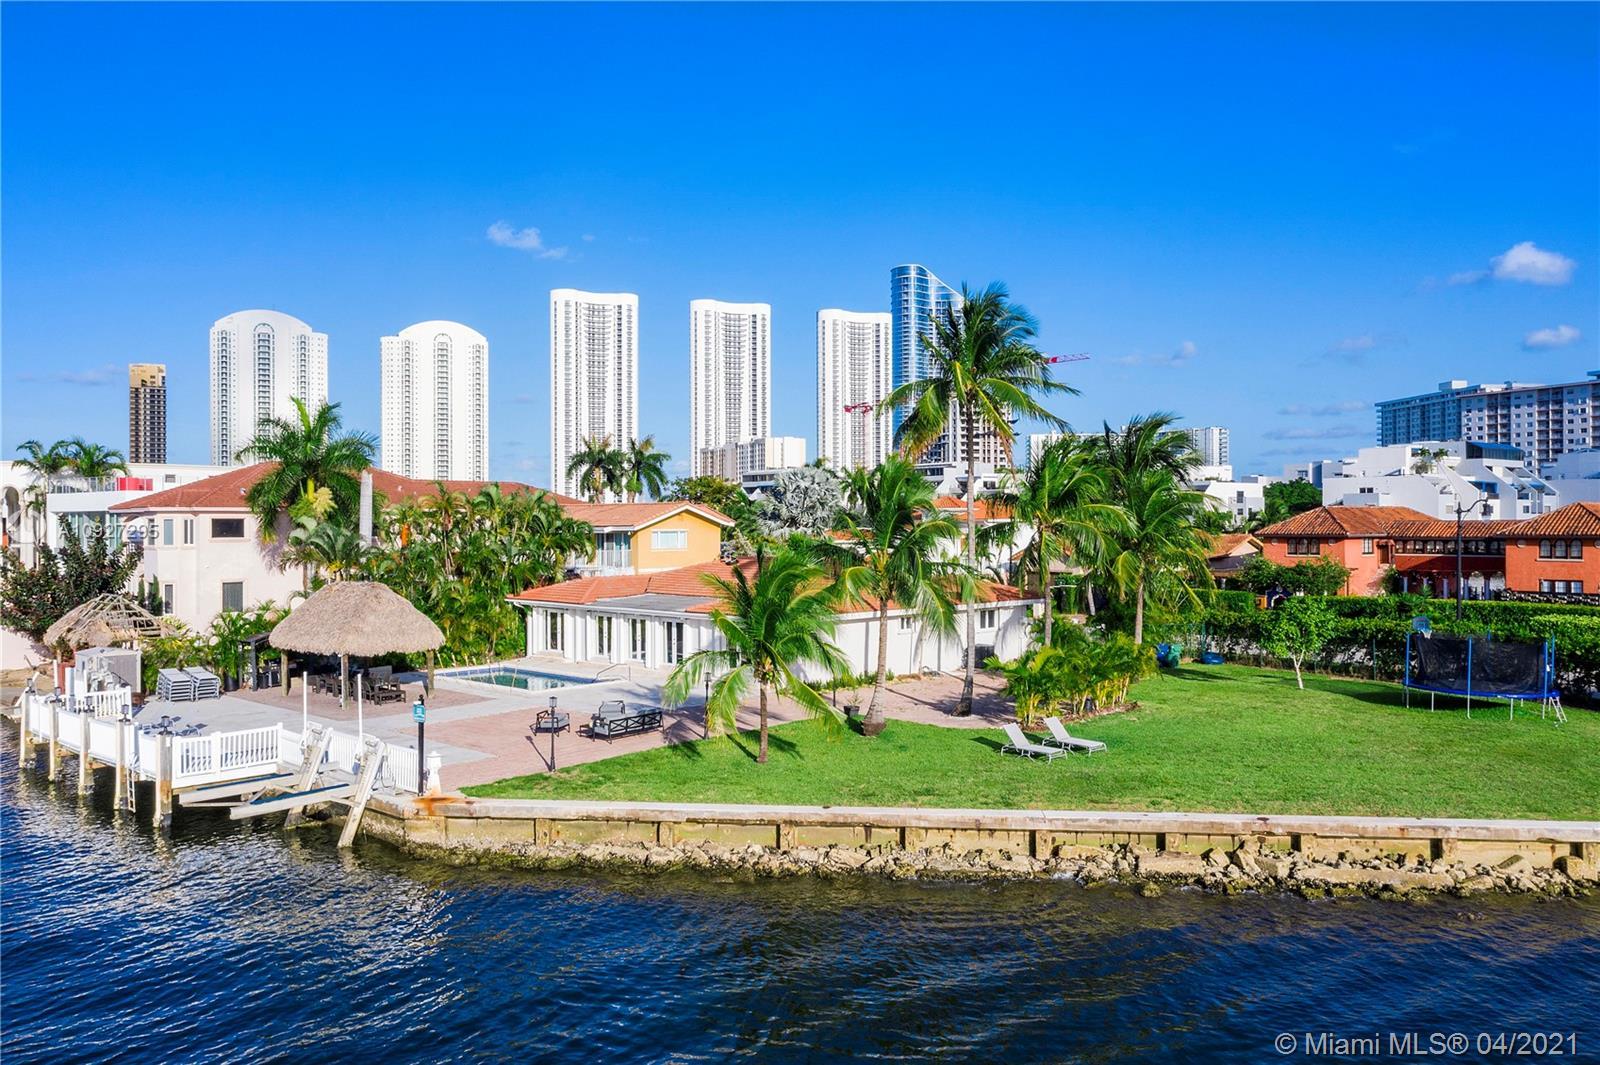 333 Atlantic Isle, Sunny Isles Beach, Florida 33160